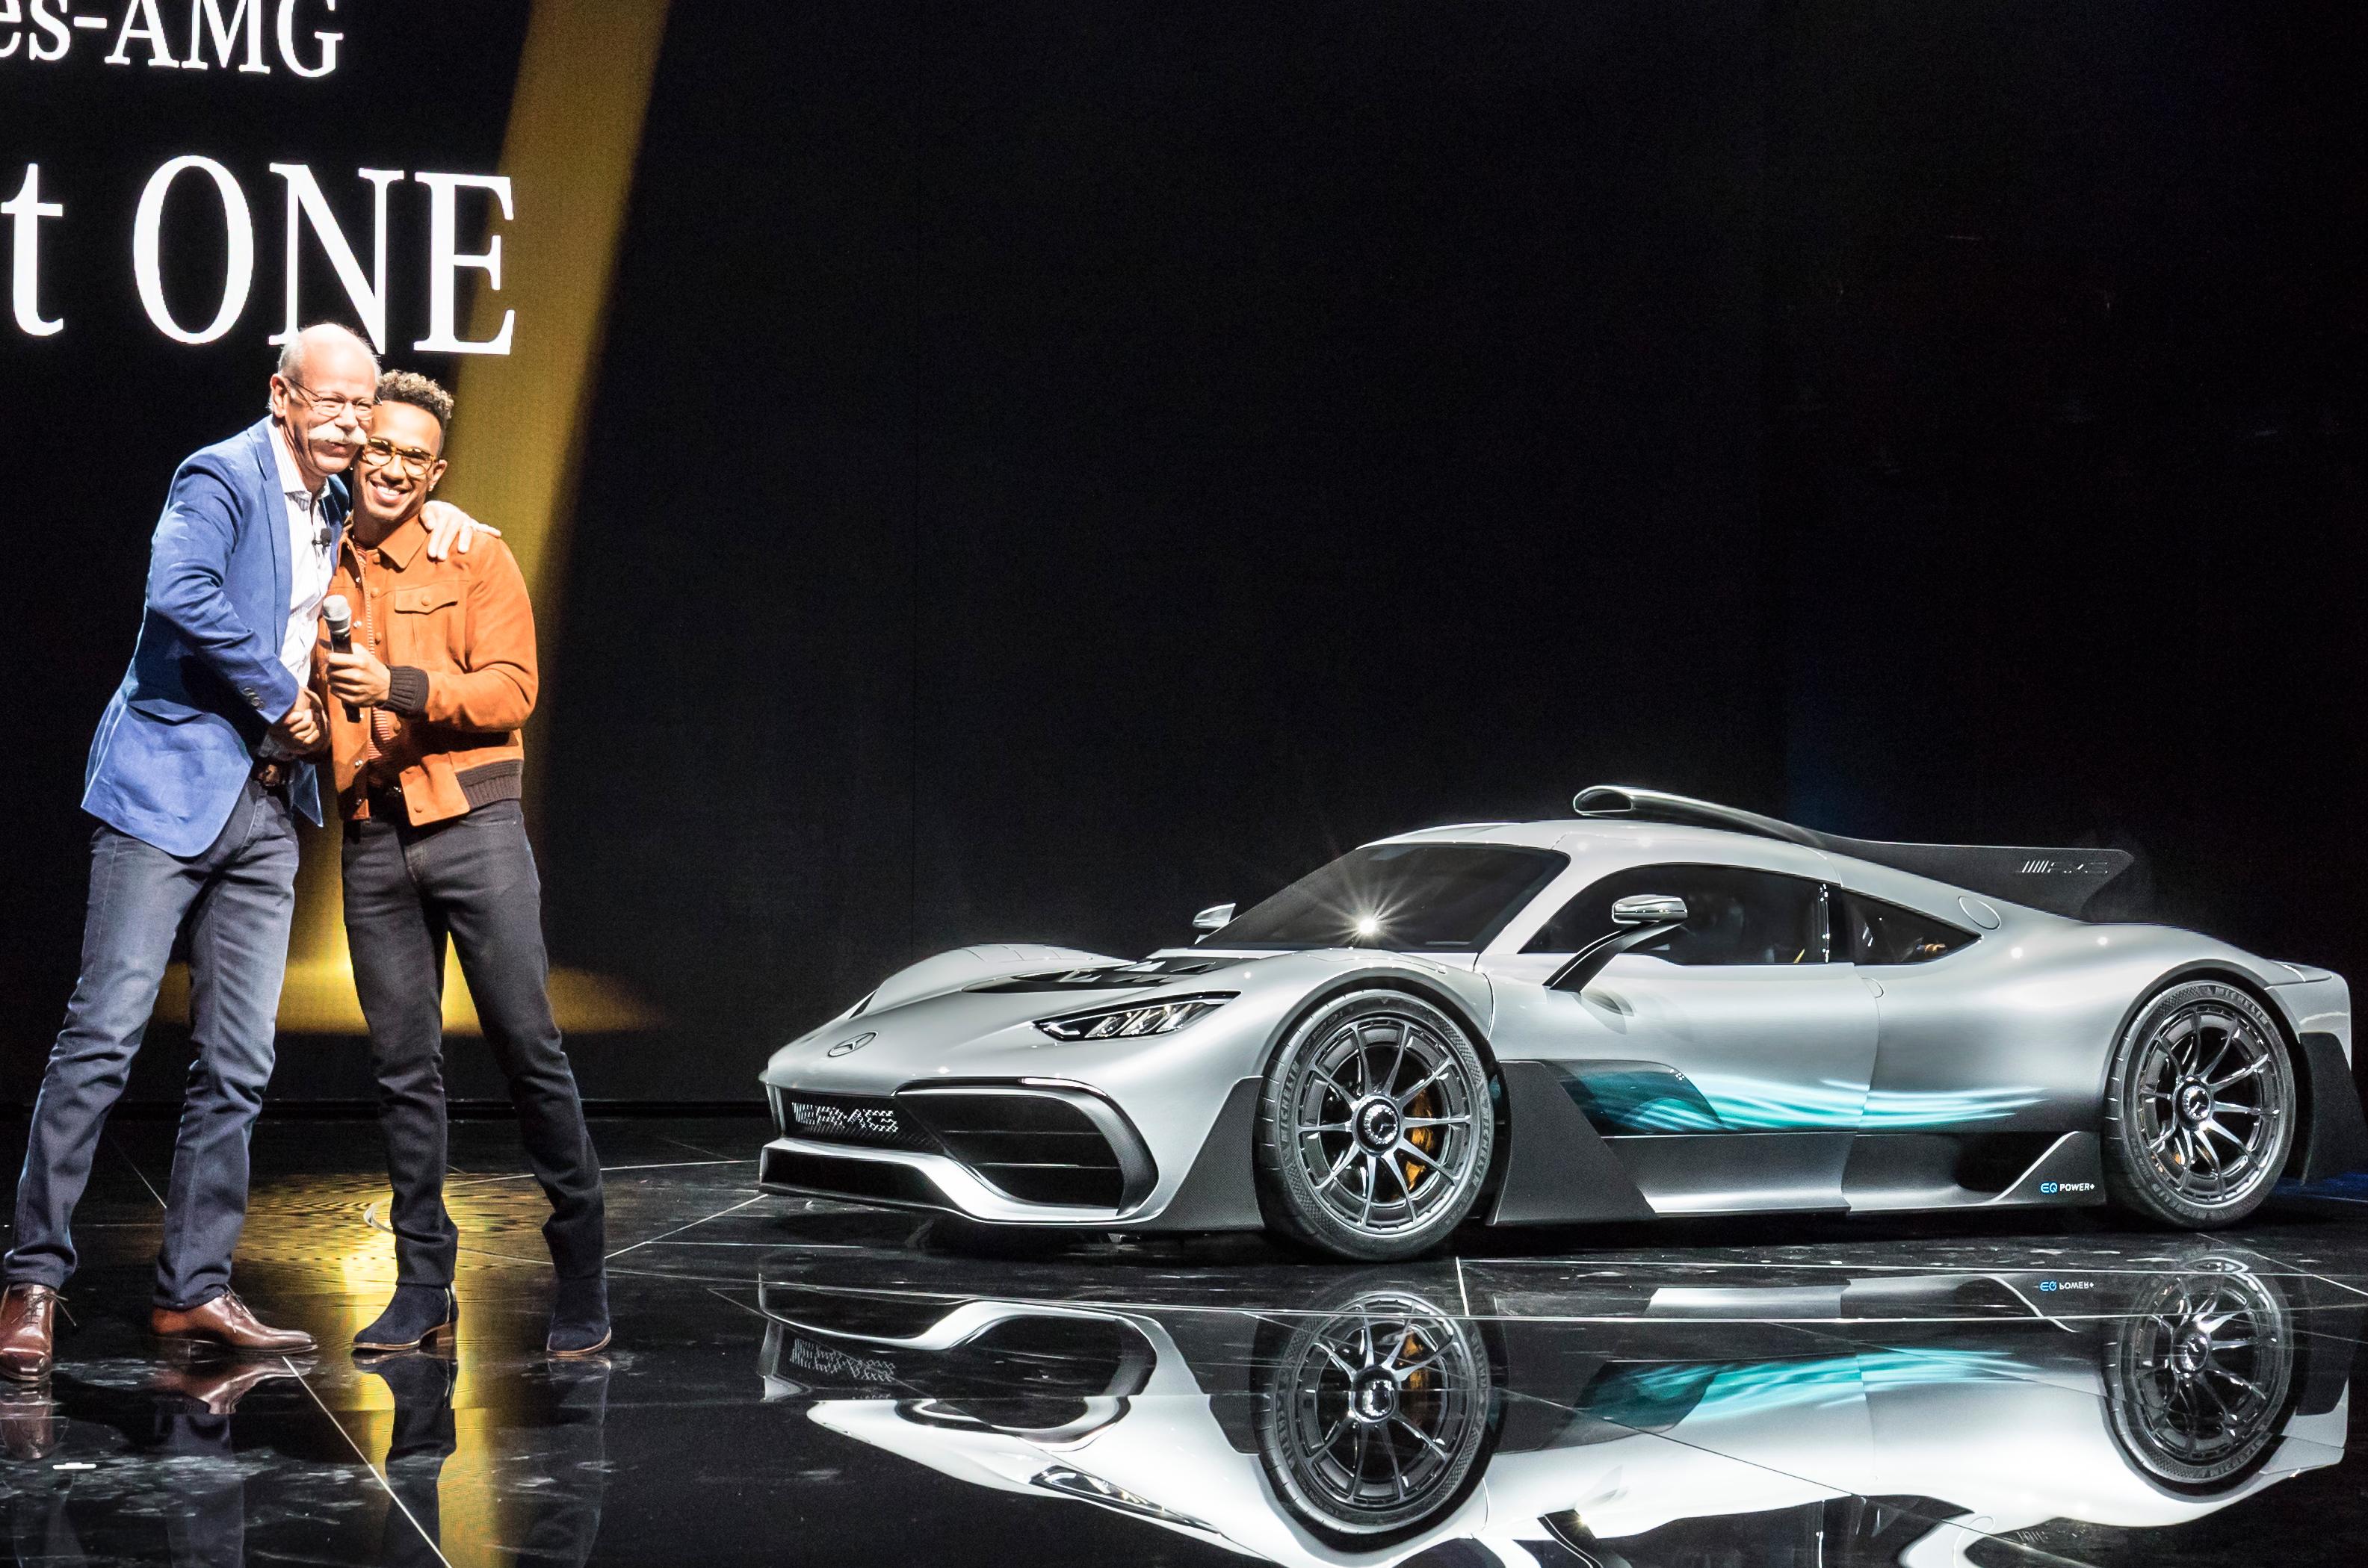 Lewis Hamilton Signed Mounted Photo Display Mercedes